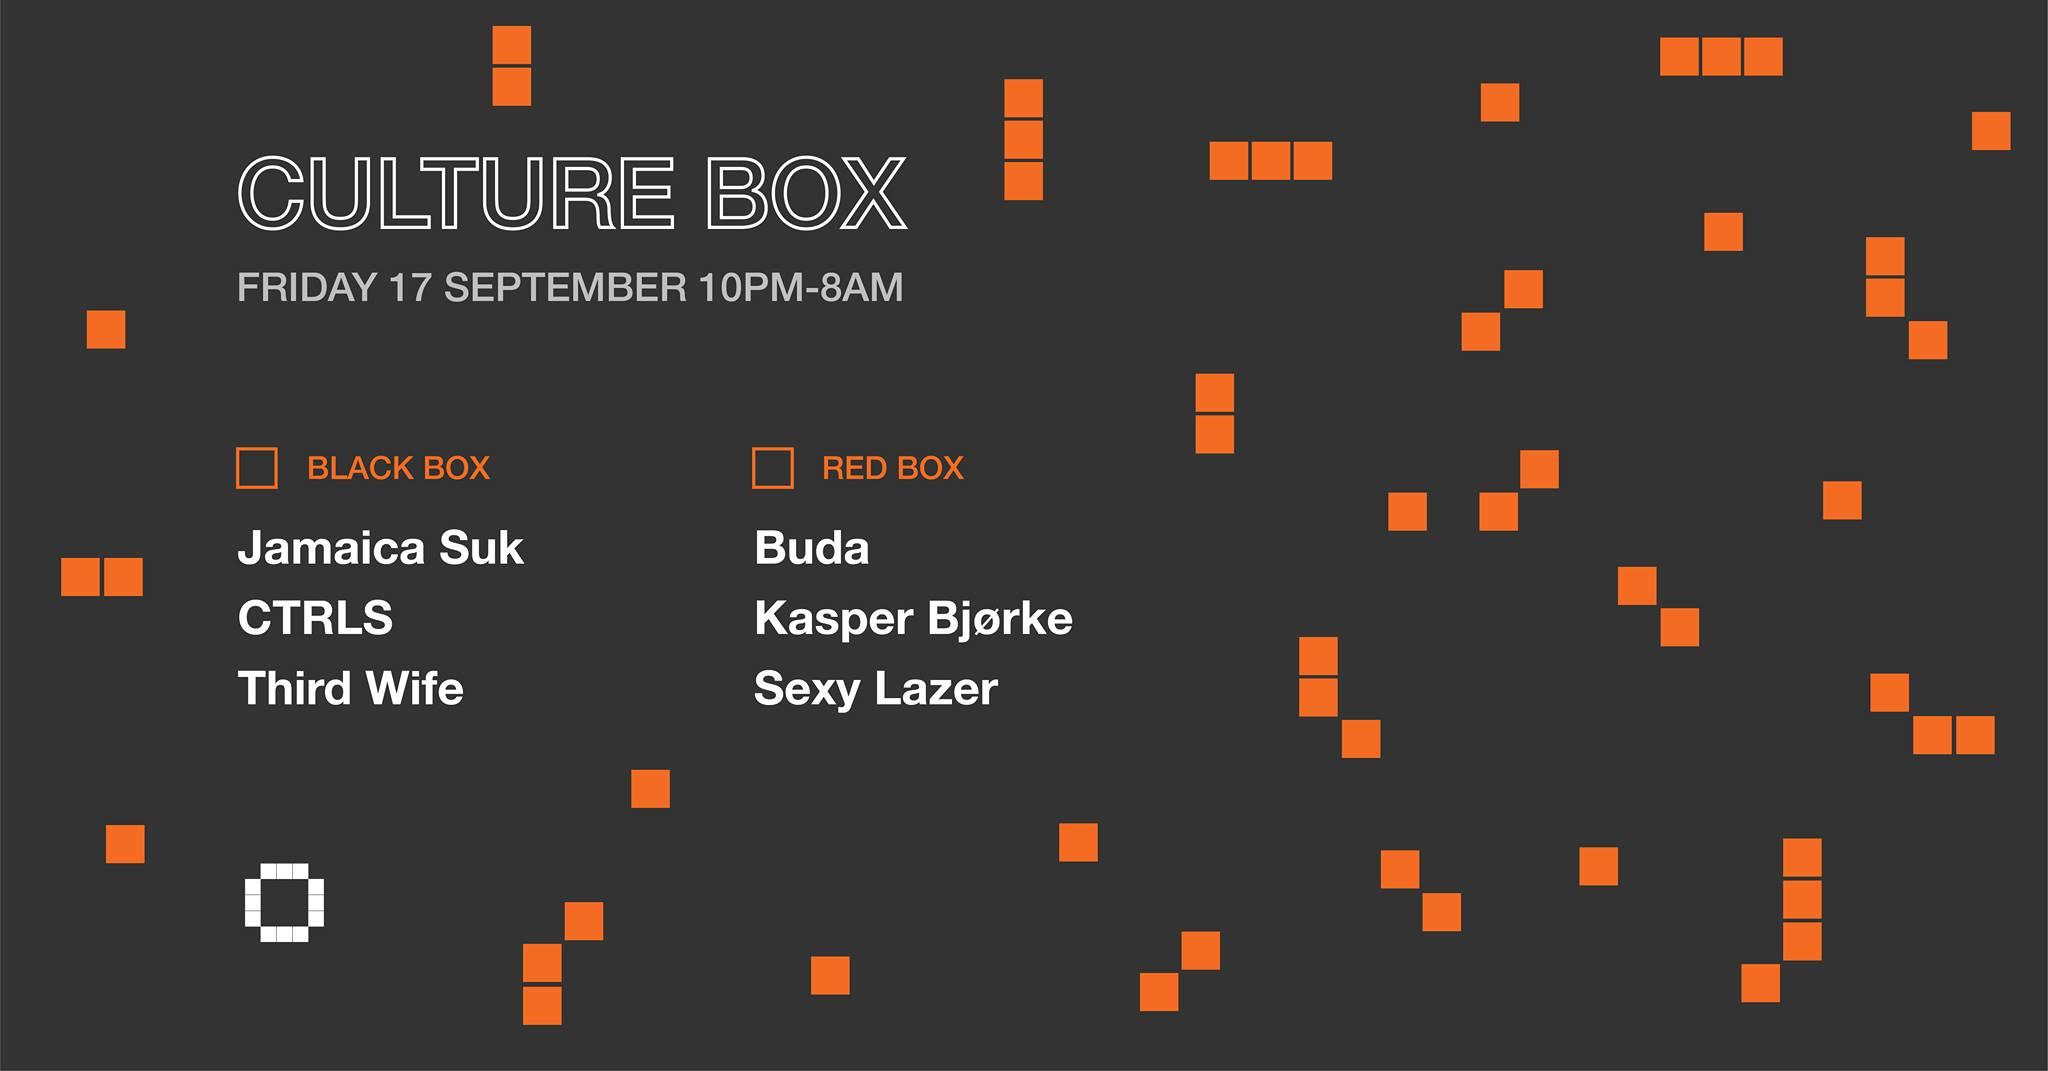 Culture Box Friday 17.09.2021